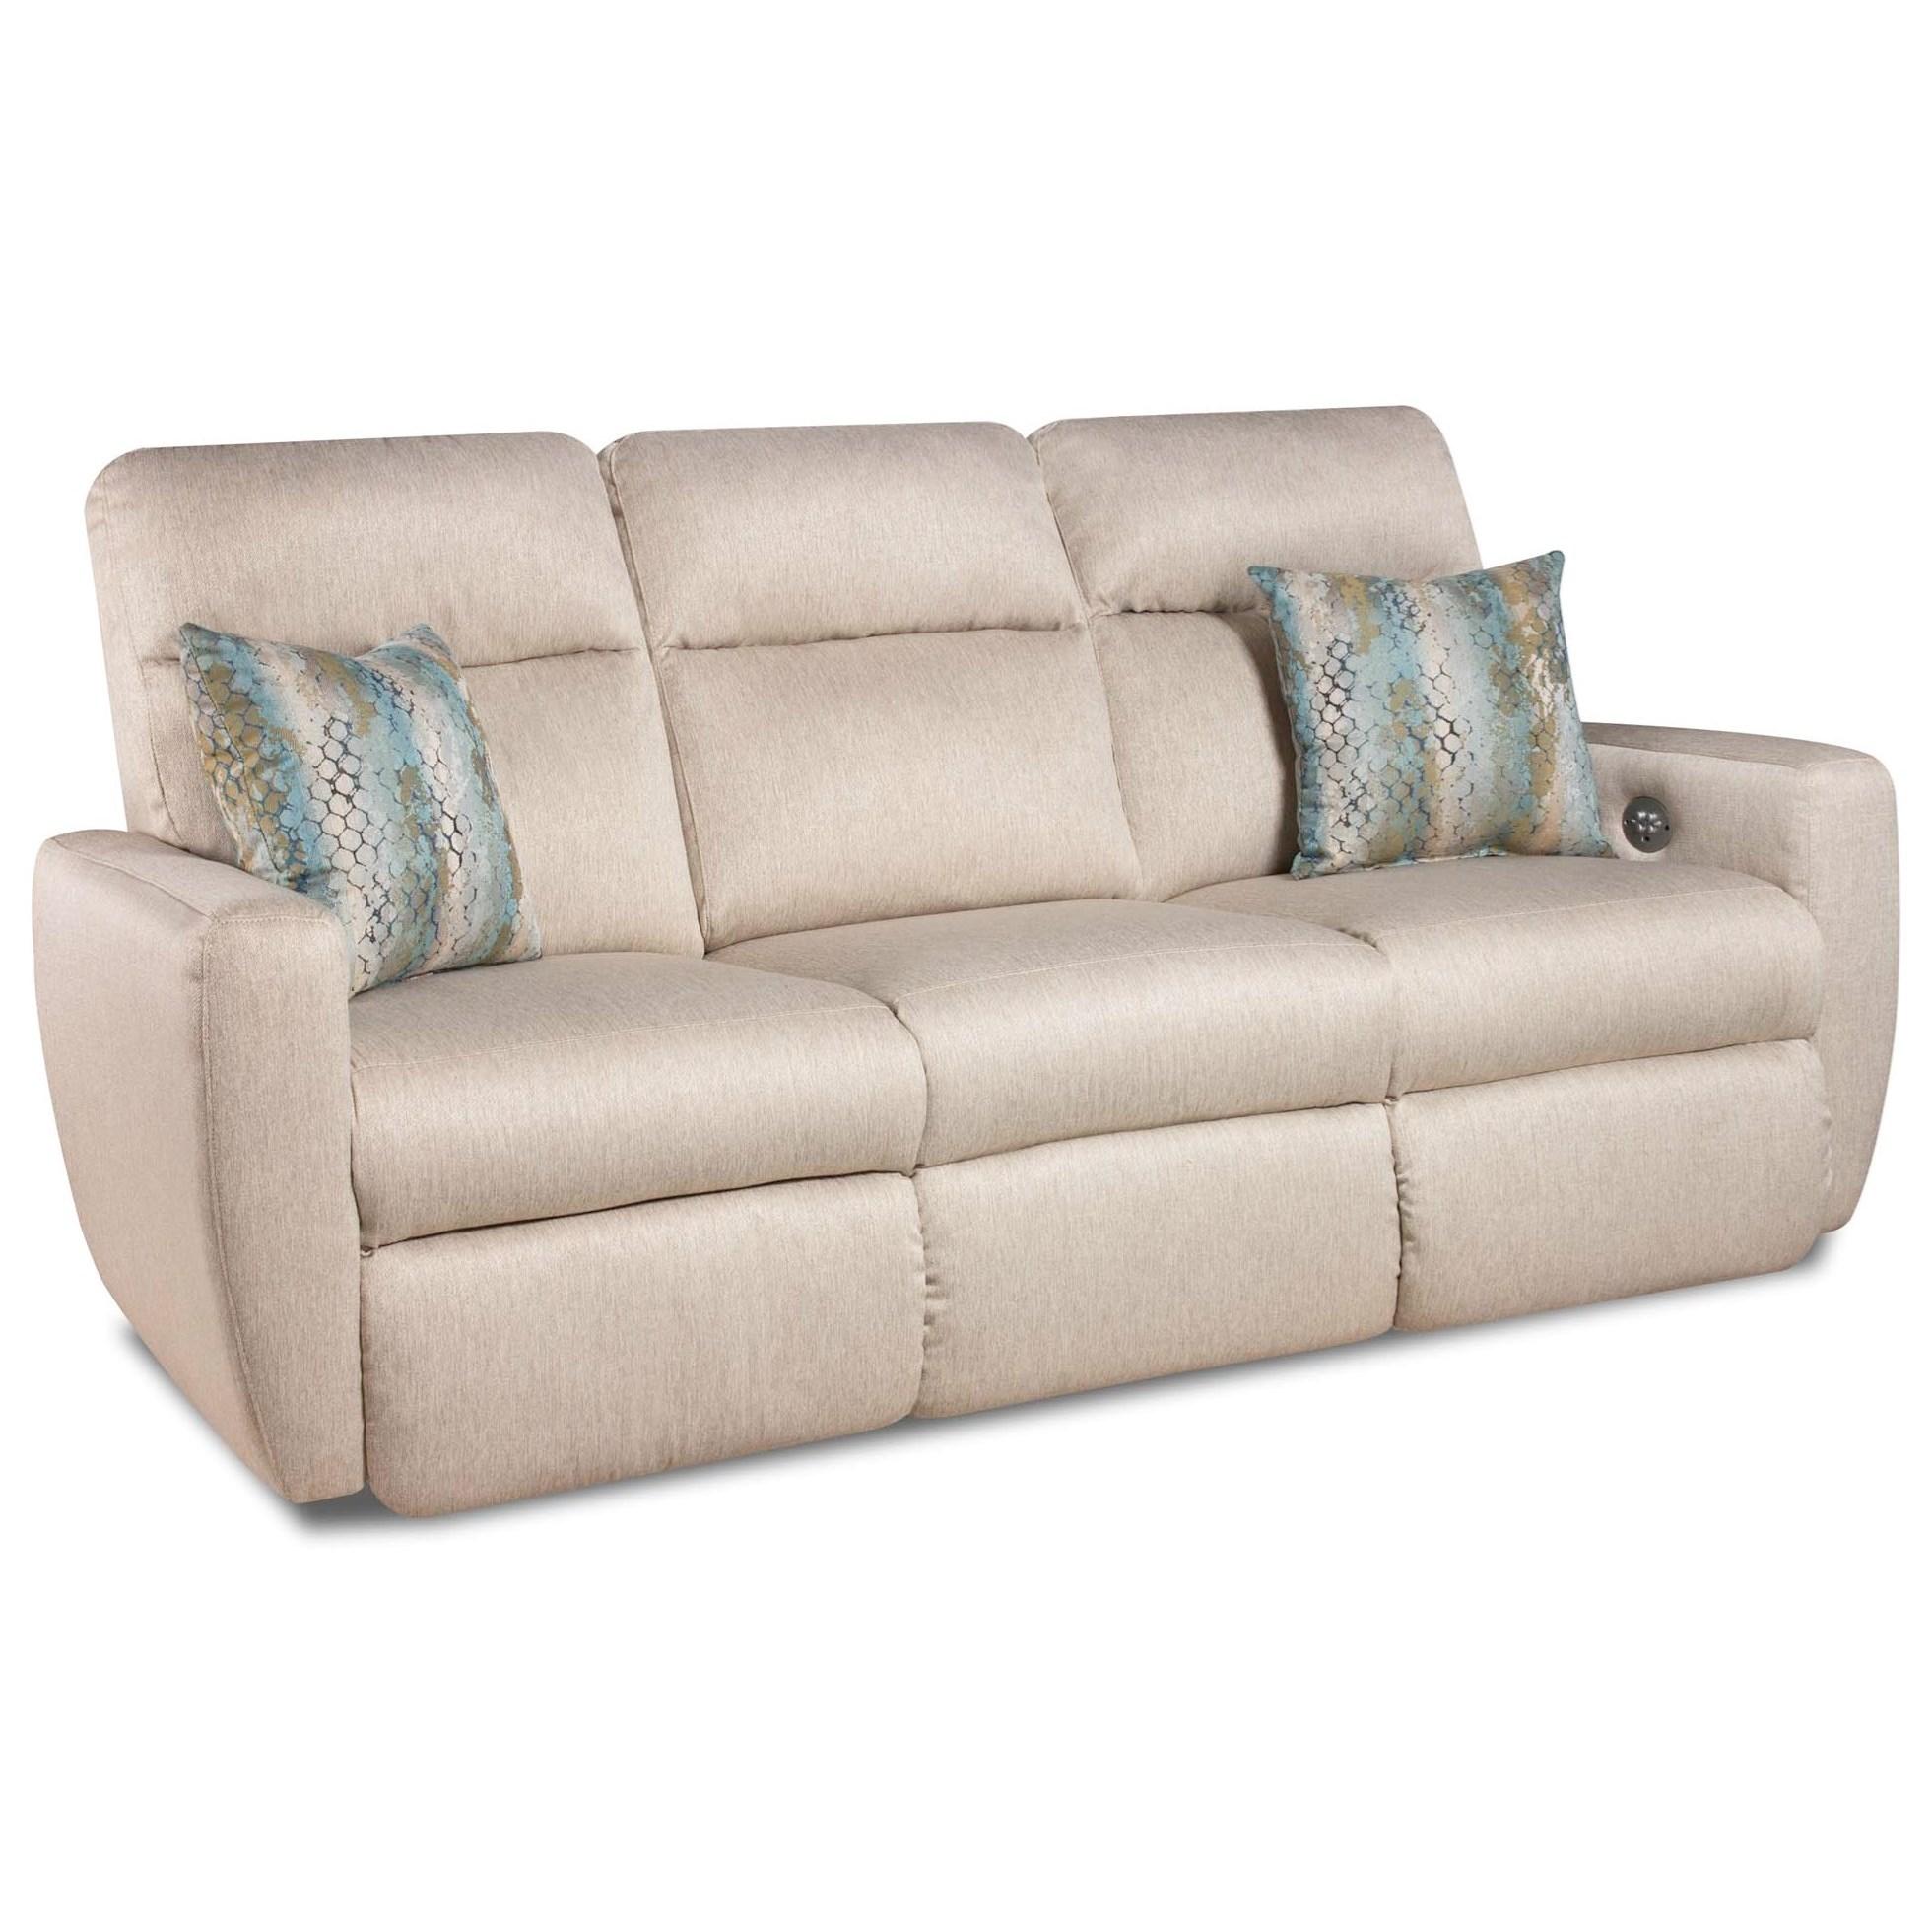 Merveilleux Southern Motion Knock OutReclining Sofa With Pillows U0026 Power Headrest